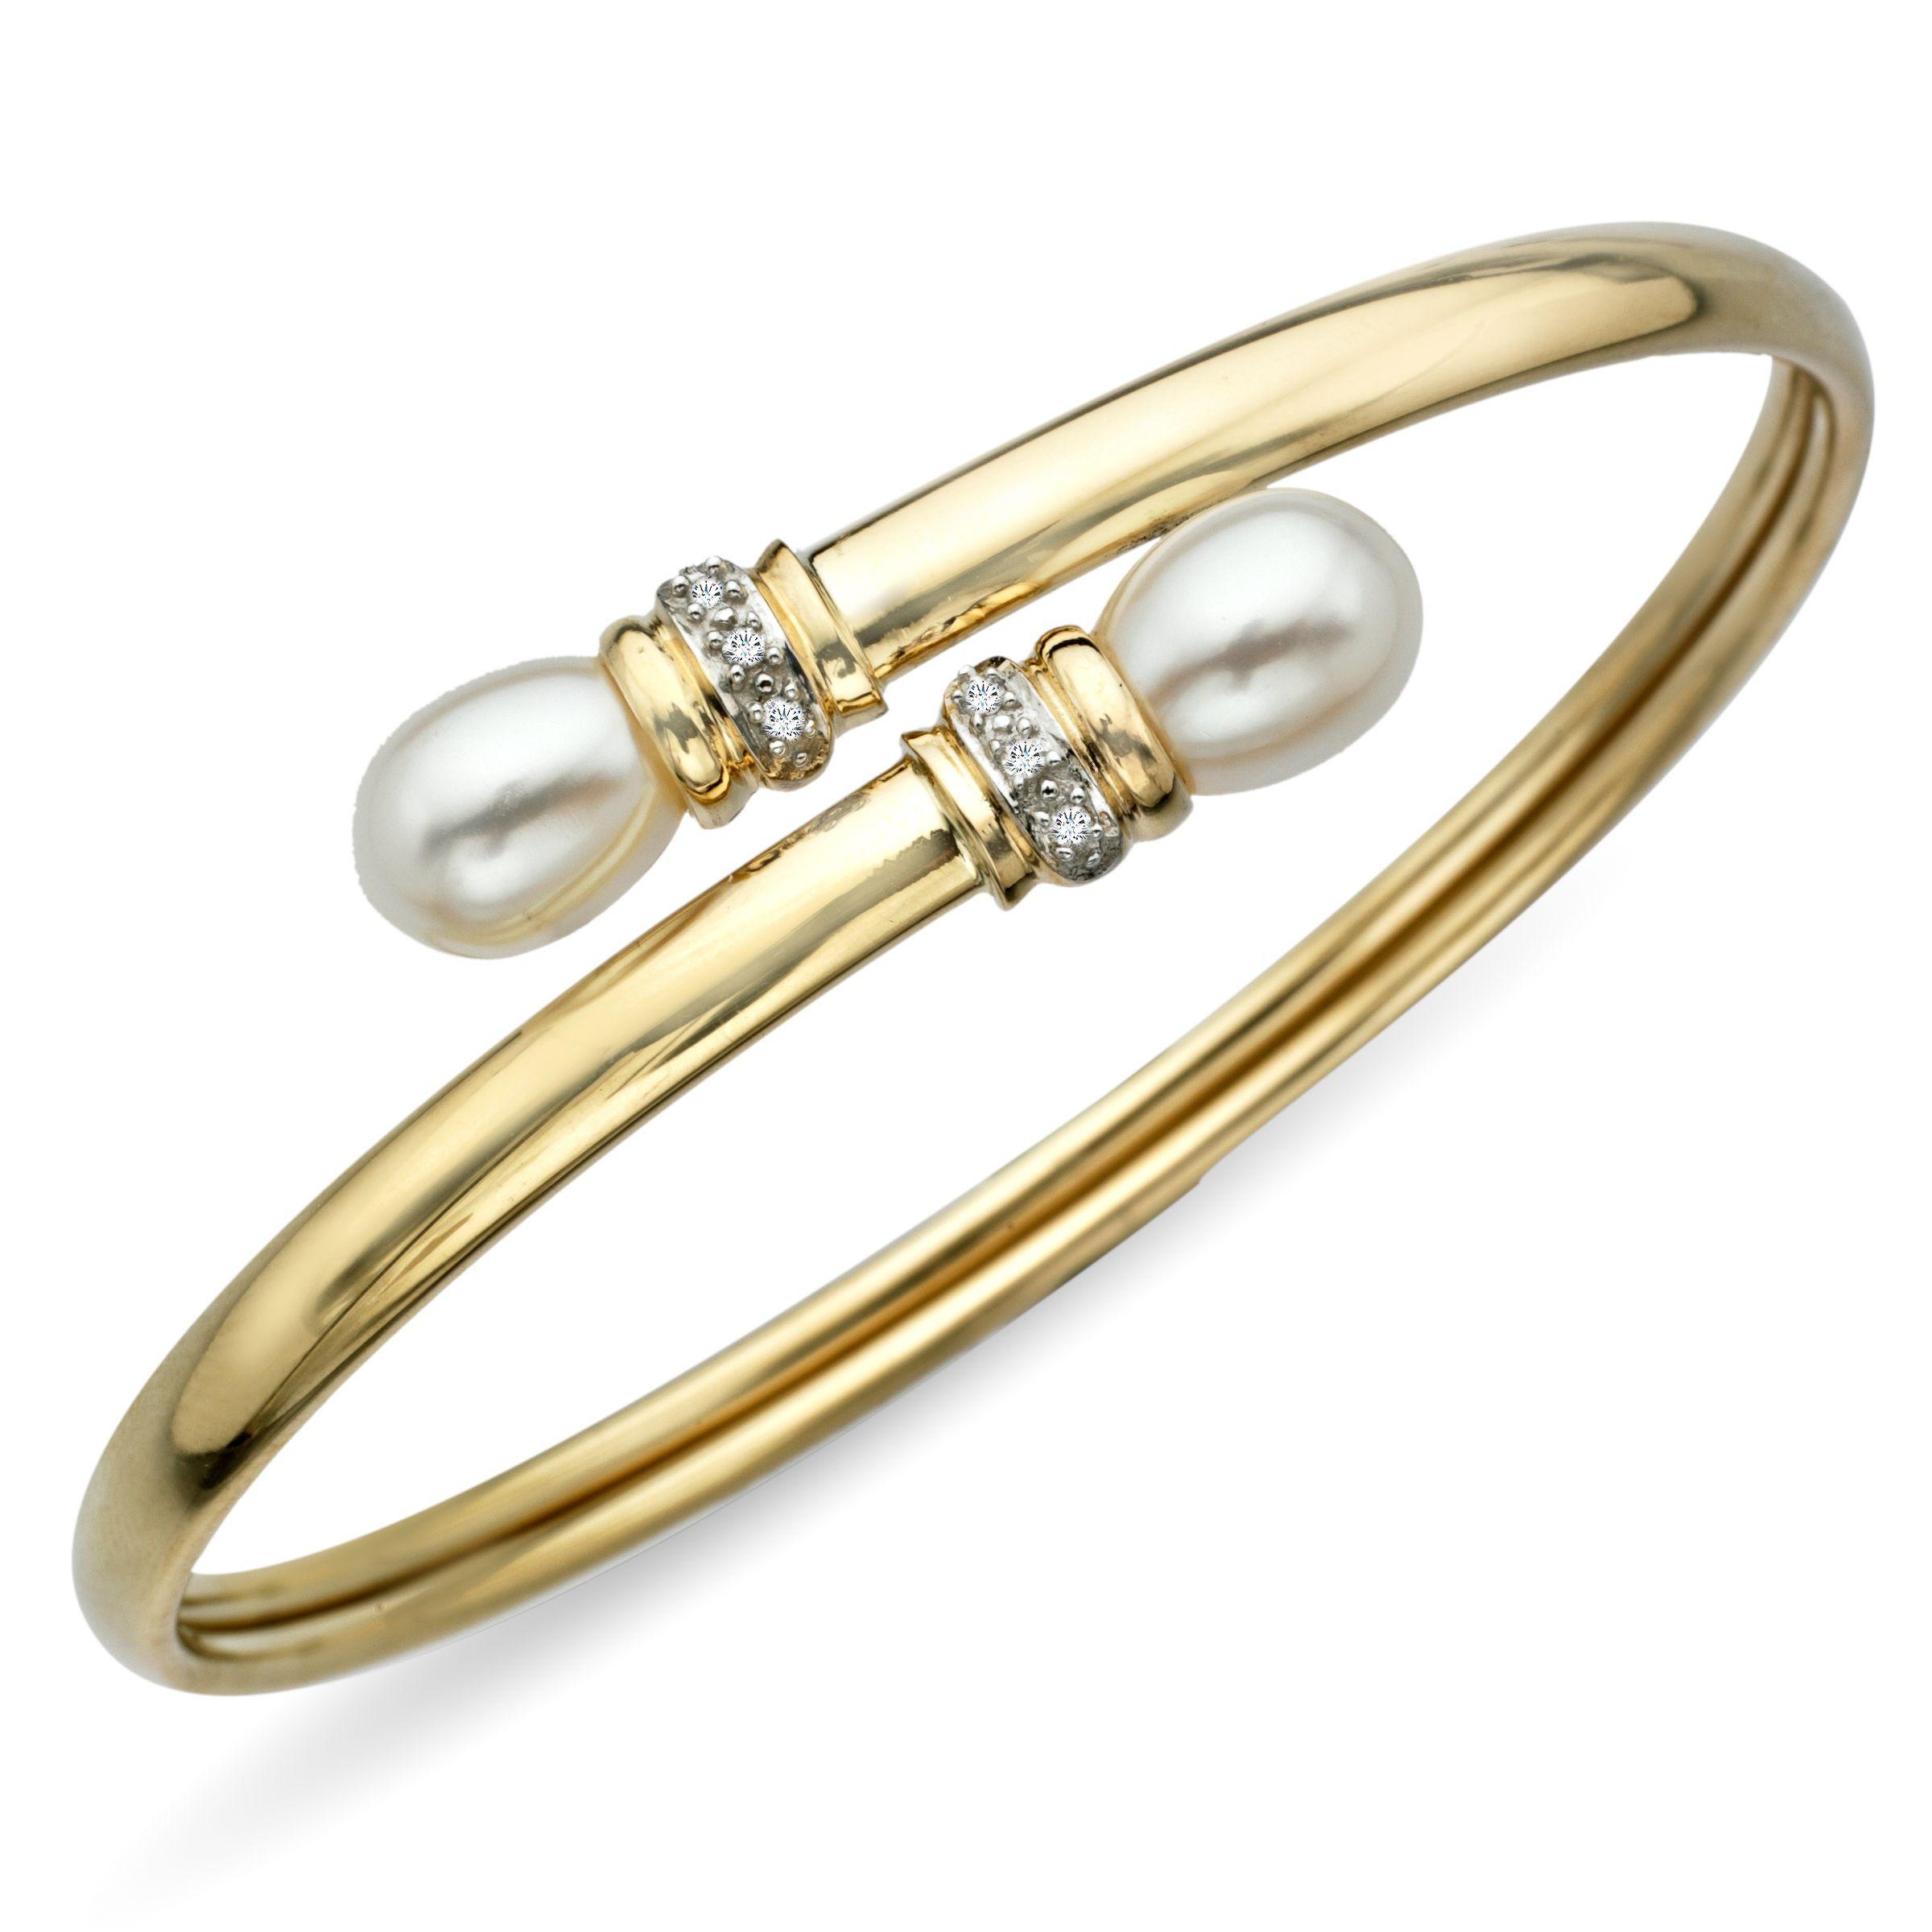 6 5 Mm Pearl Bangle Bracelet With Diamonds In 10k Gold